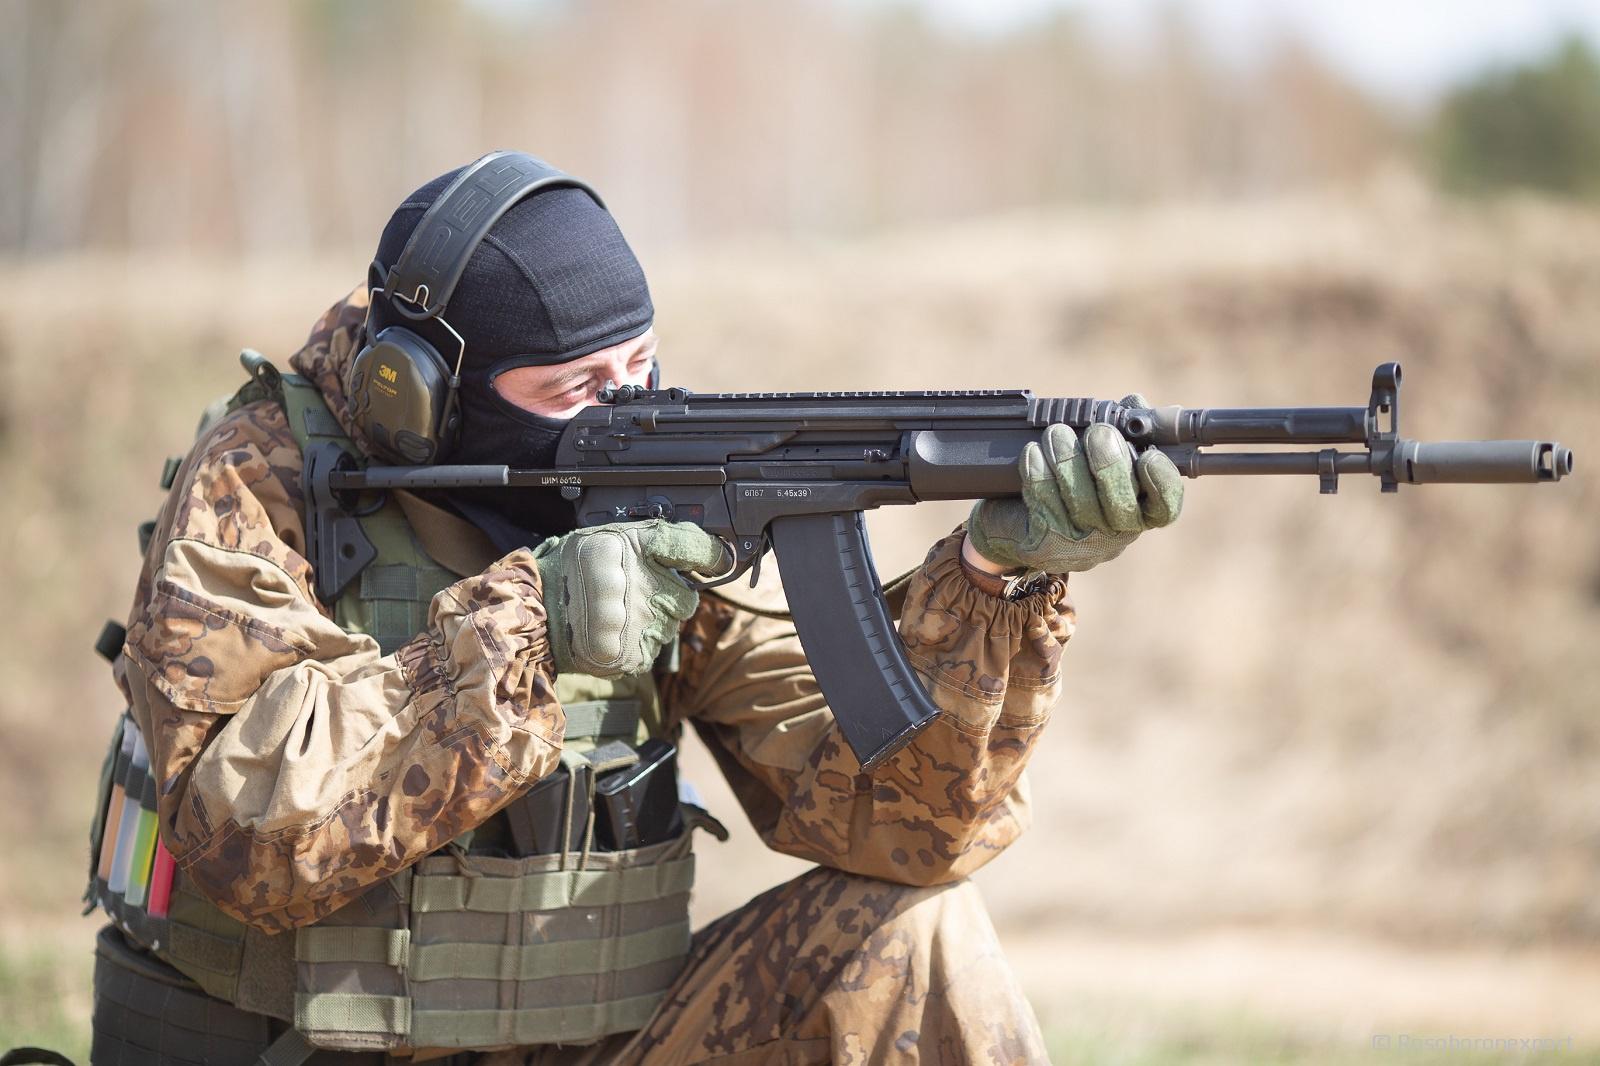 Russian Assault Rifles/Carbines/Machine Guns Thread: #2 - Page 10 F7e1935c748f2caf06317c4a1e1796e7